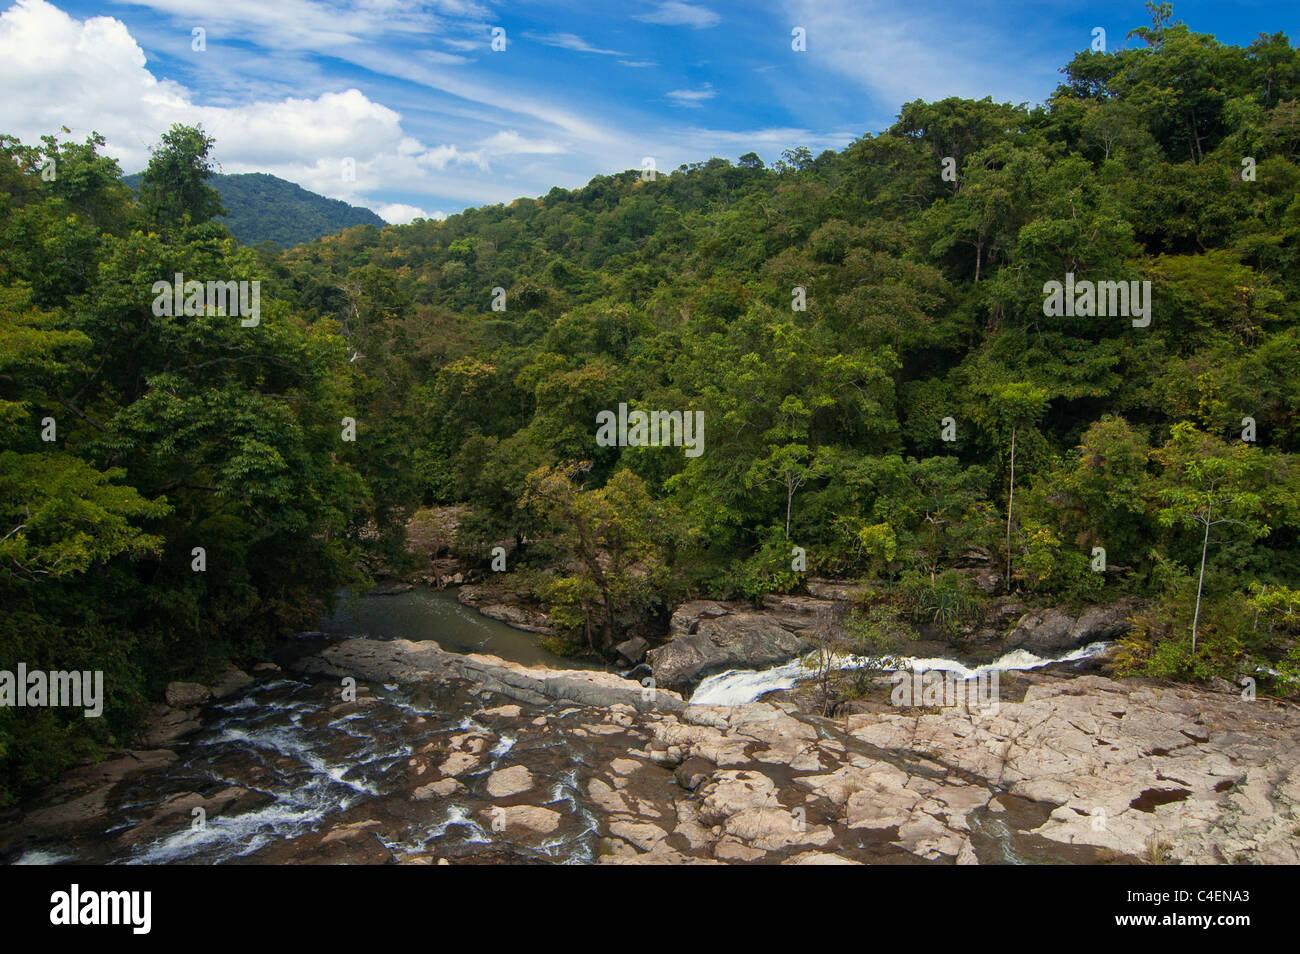 Aik Beling River and Rain Forest at Brang Rea, Sumbawa - Stock Image